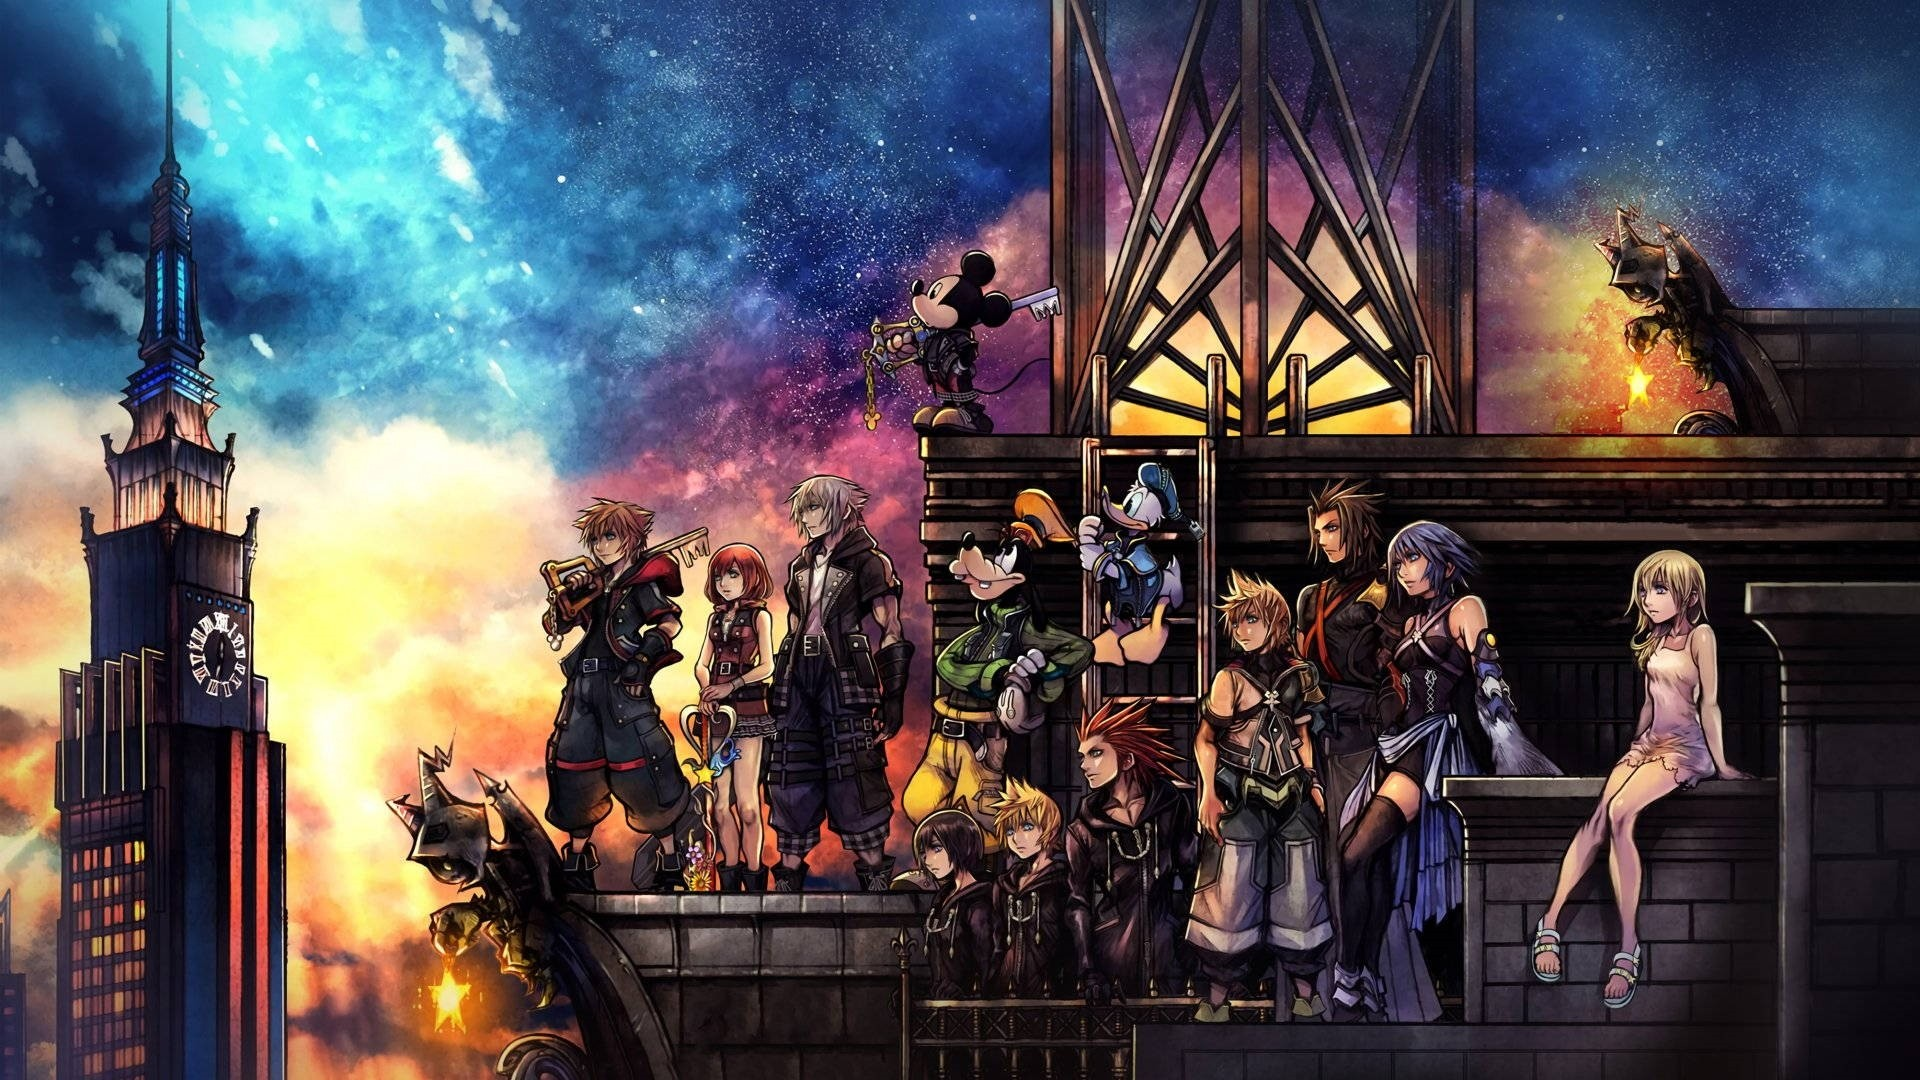 Kingdom Hearts 3 Free Wallpaper